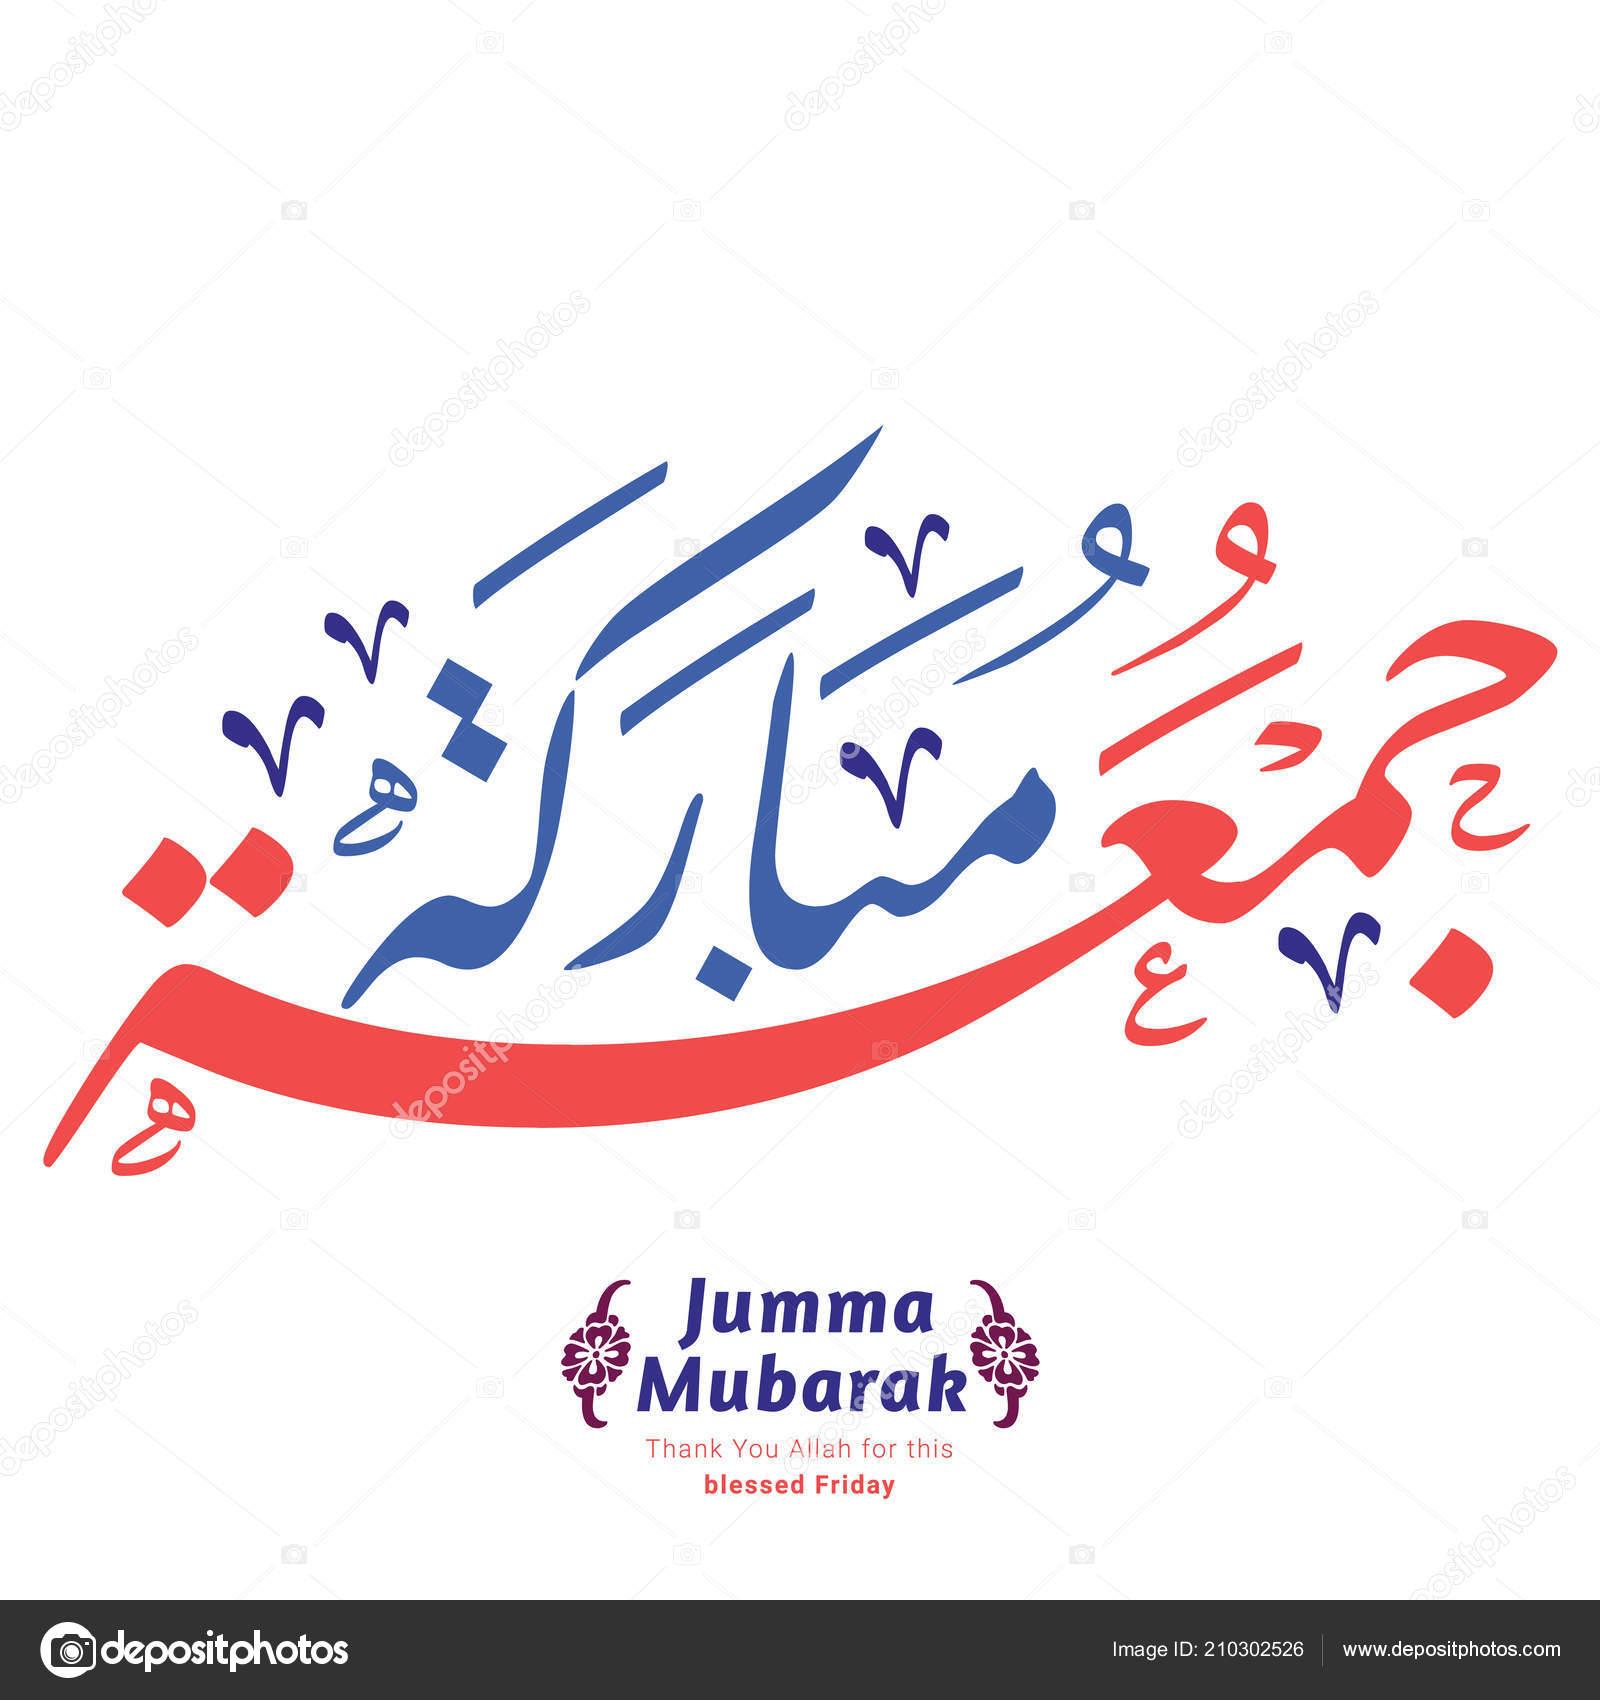 Ihotos Jummah Mubarak Jumma Mubarak Arabic Calligraphy